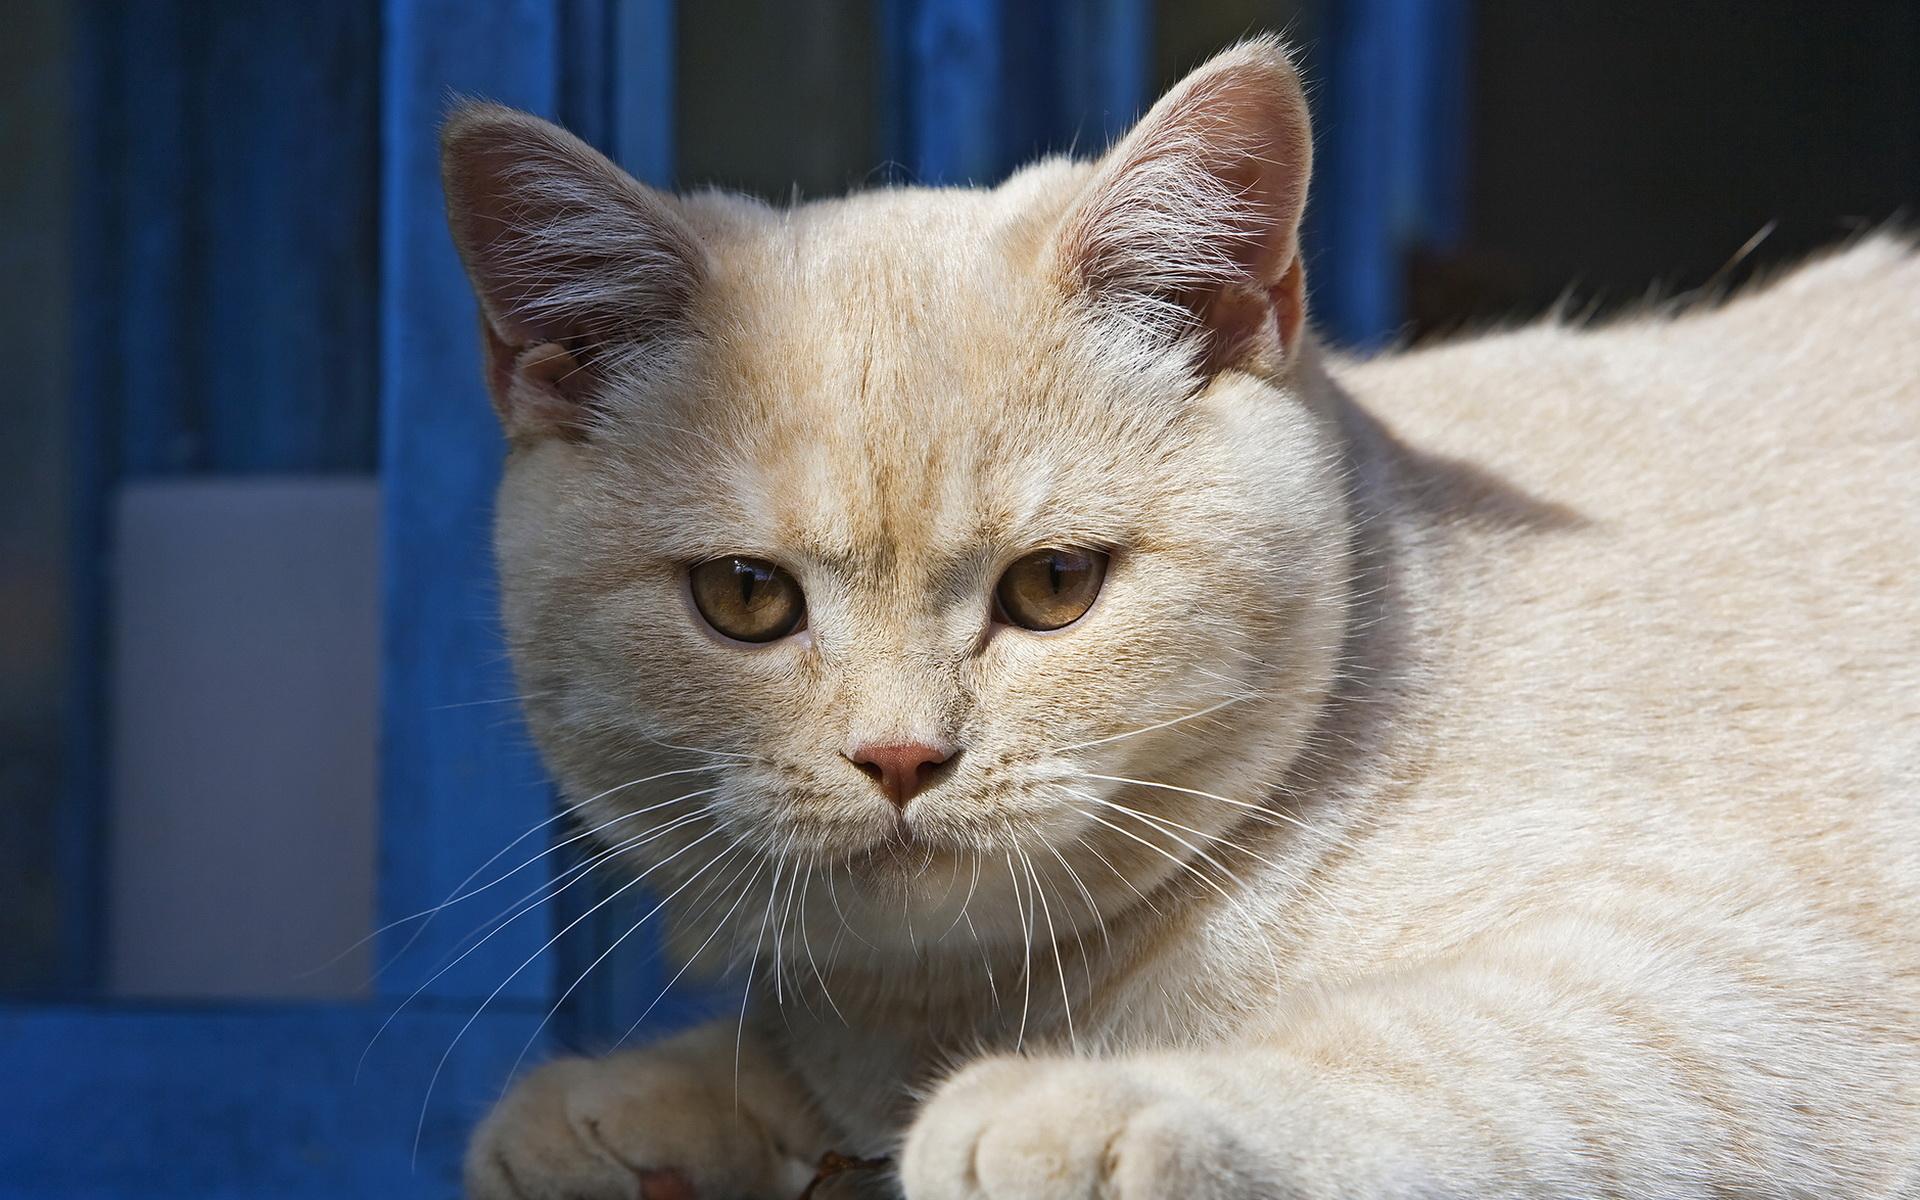 Animals_Cats_Cute_cat_032597_